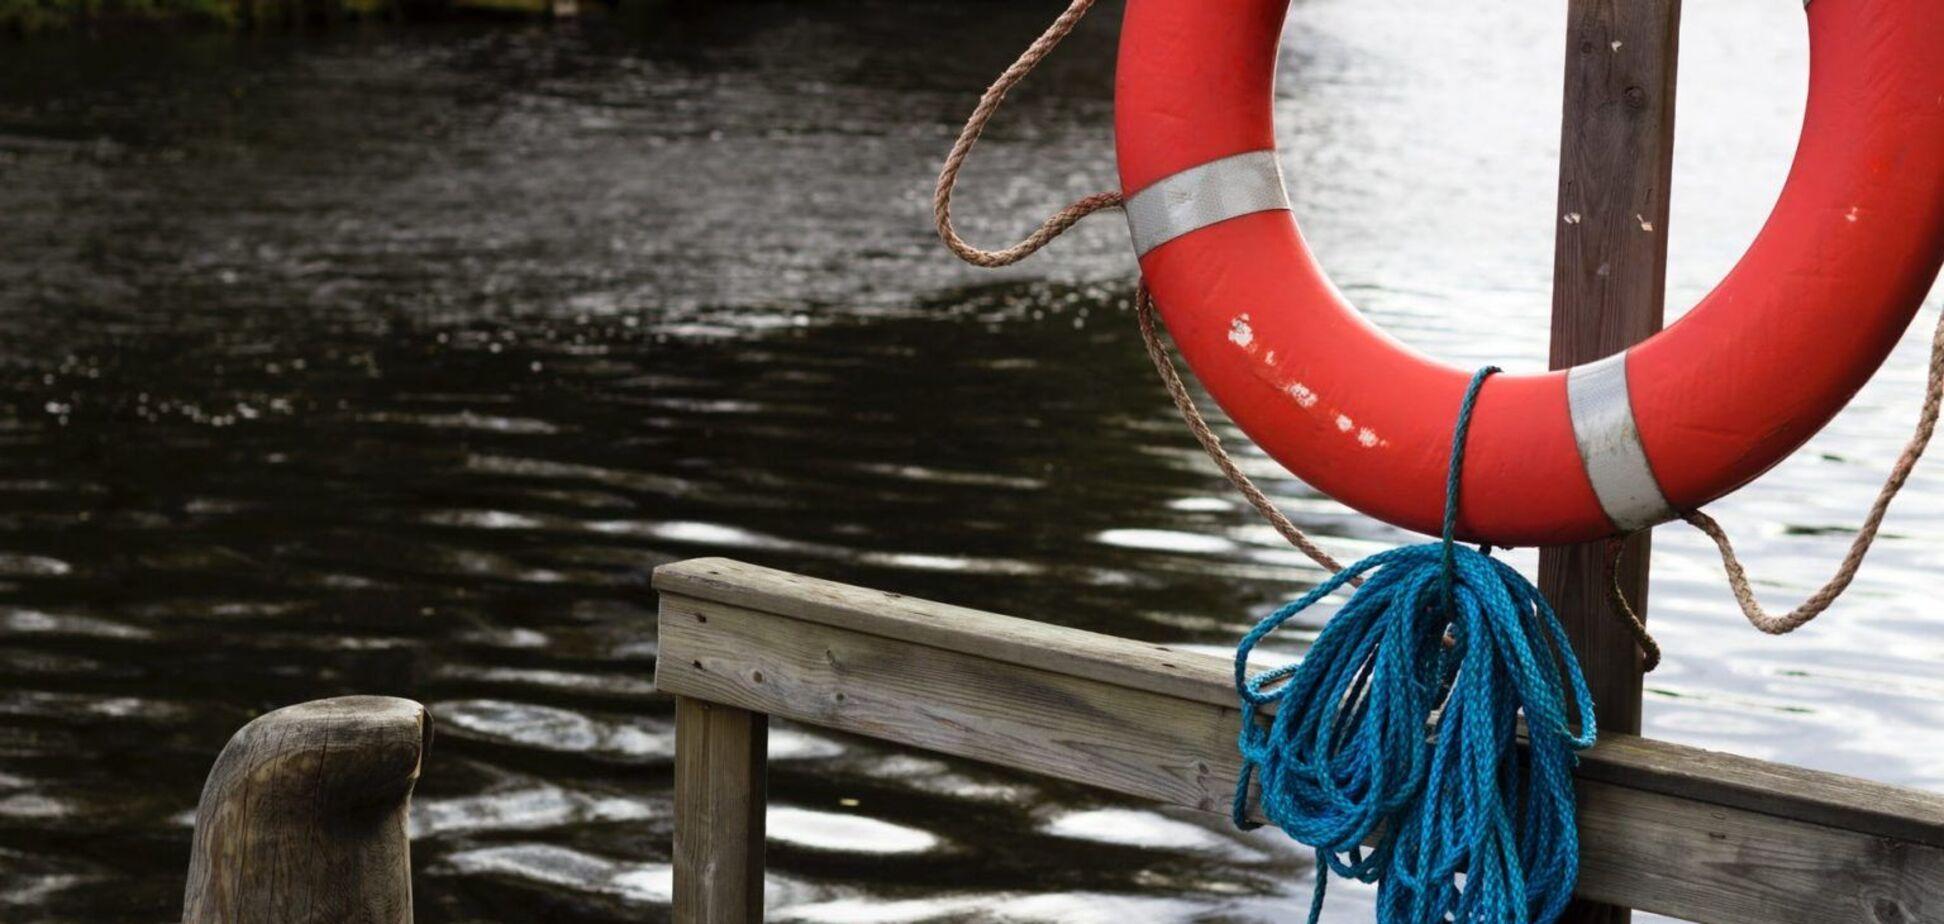 На Днепропетровщине пропавшего мужчину нашли утонувшим в реке